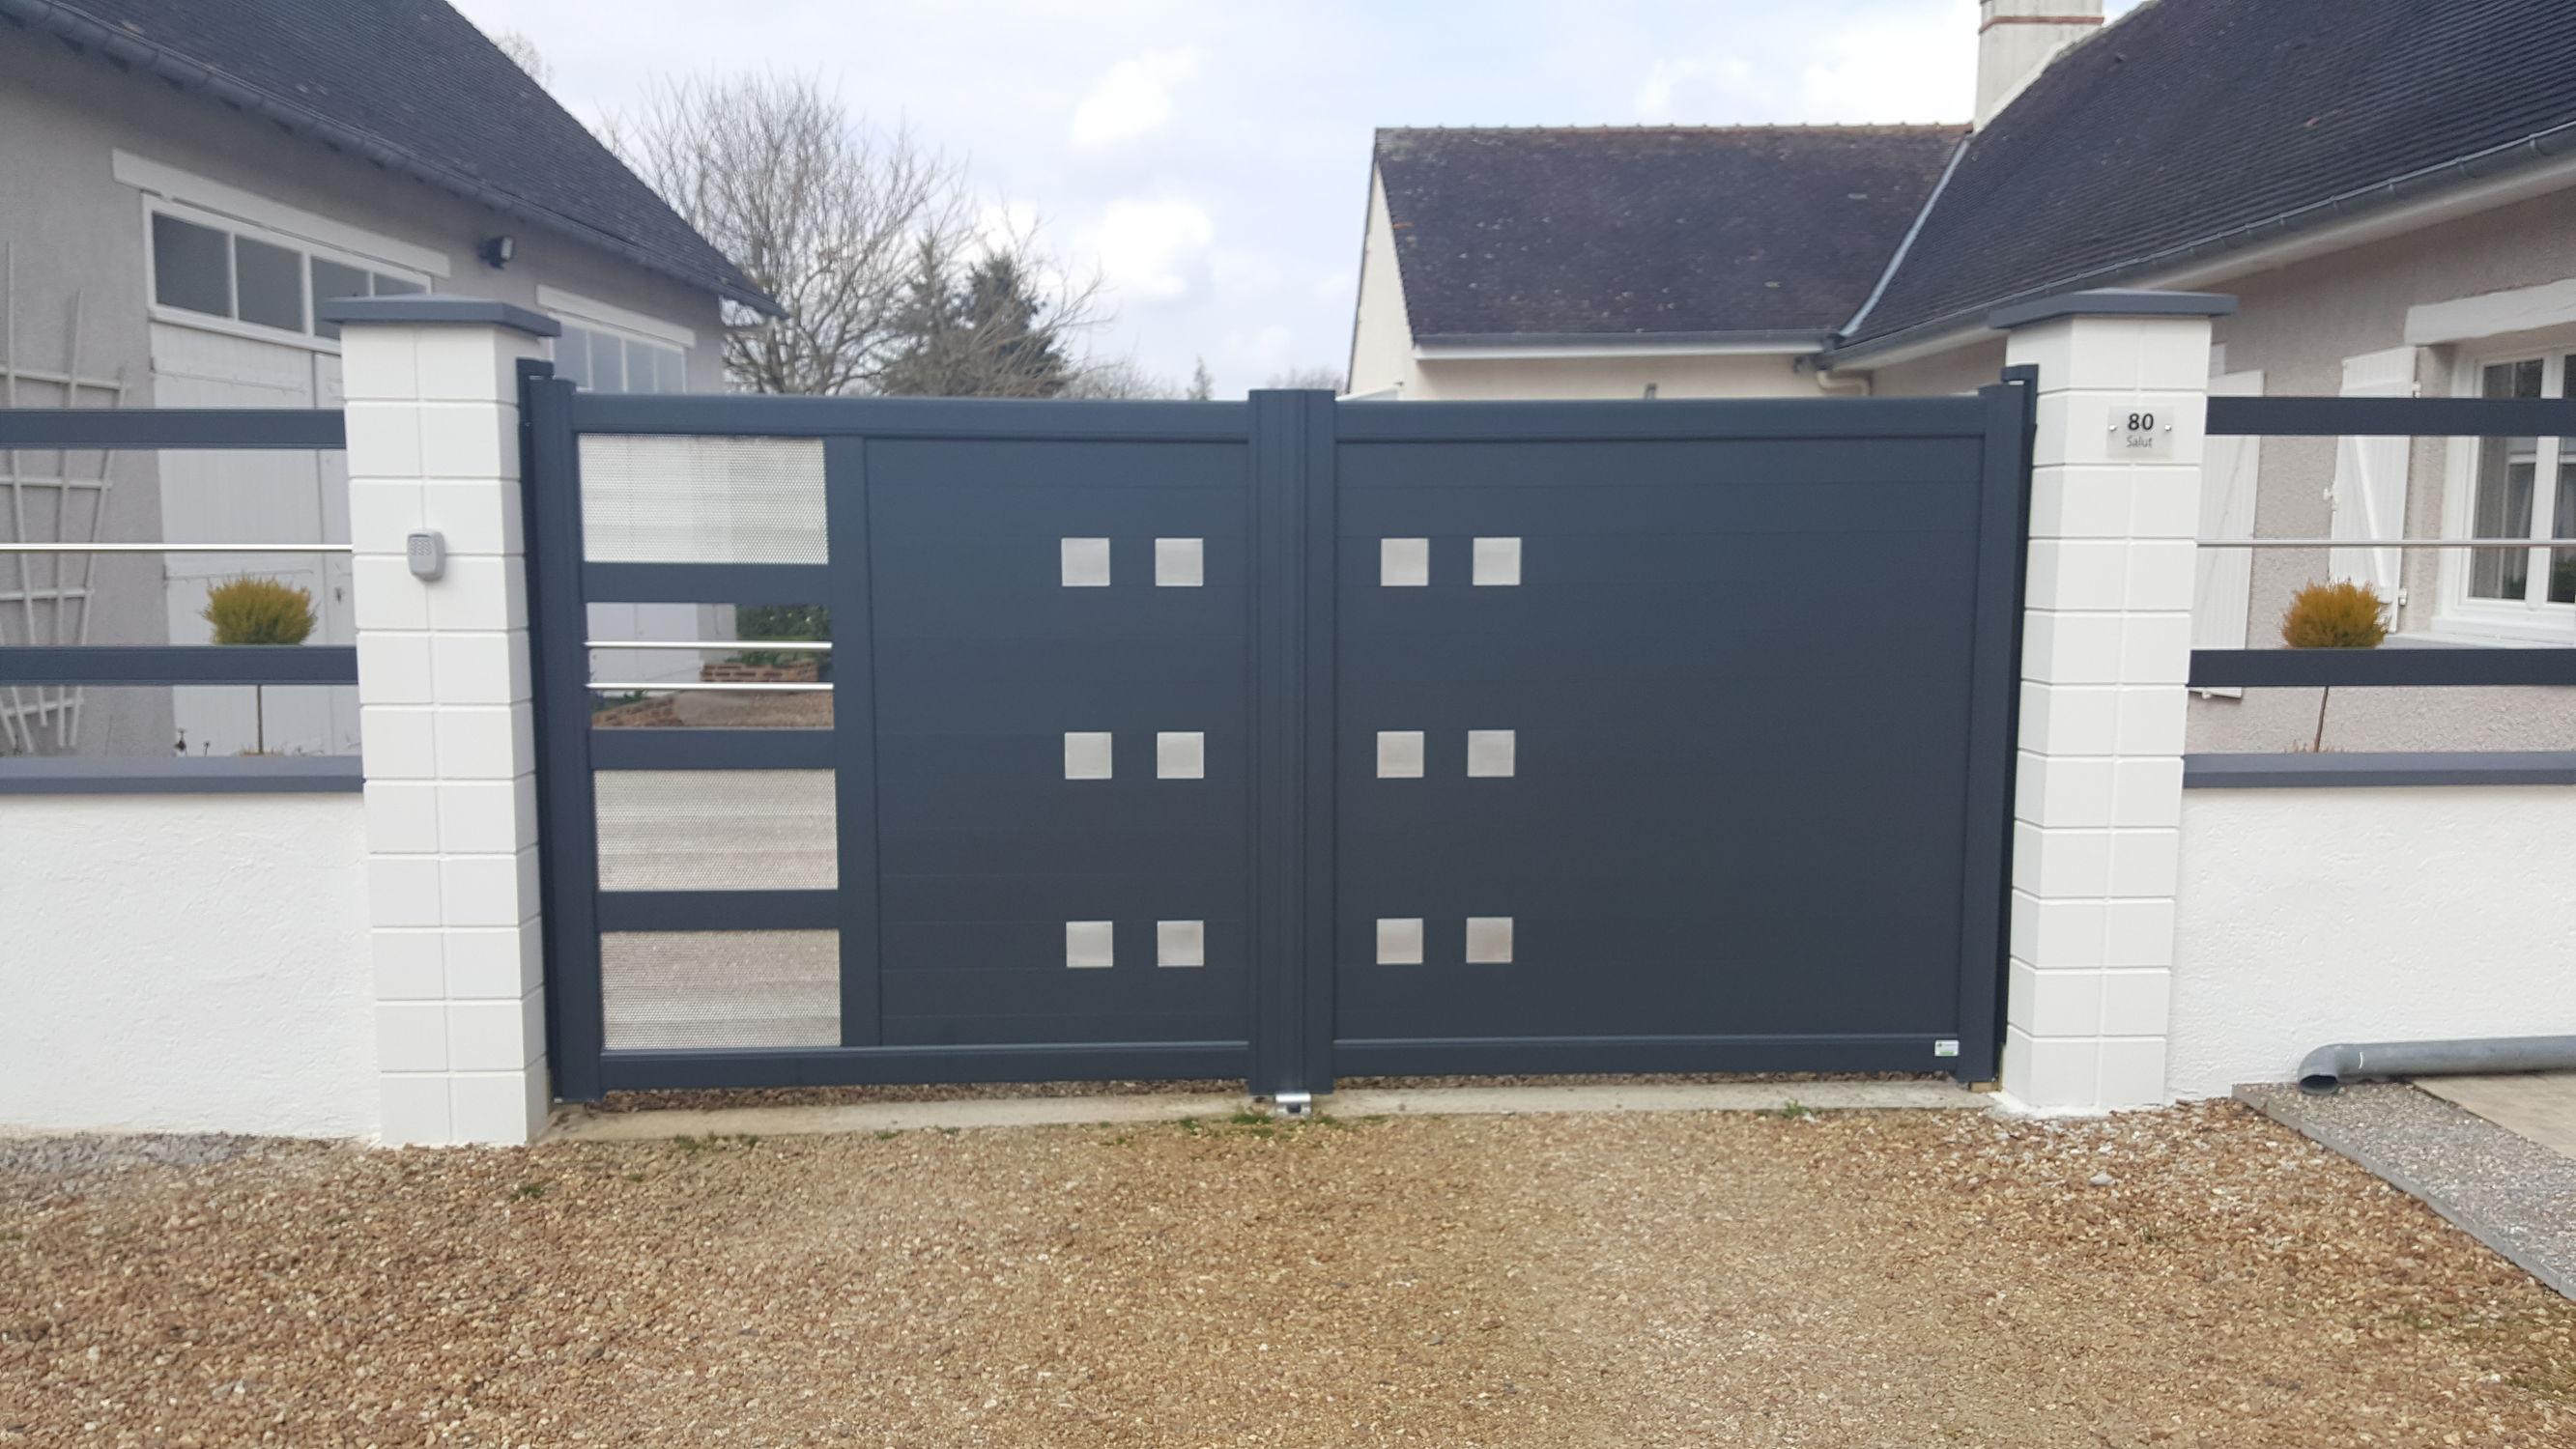 gallery swing simple inspiration of hardware does doors hinges tilt french garage hally holmes up swinging door design